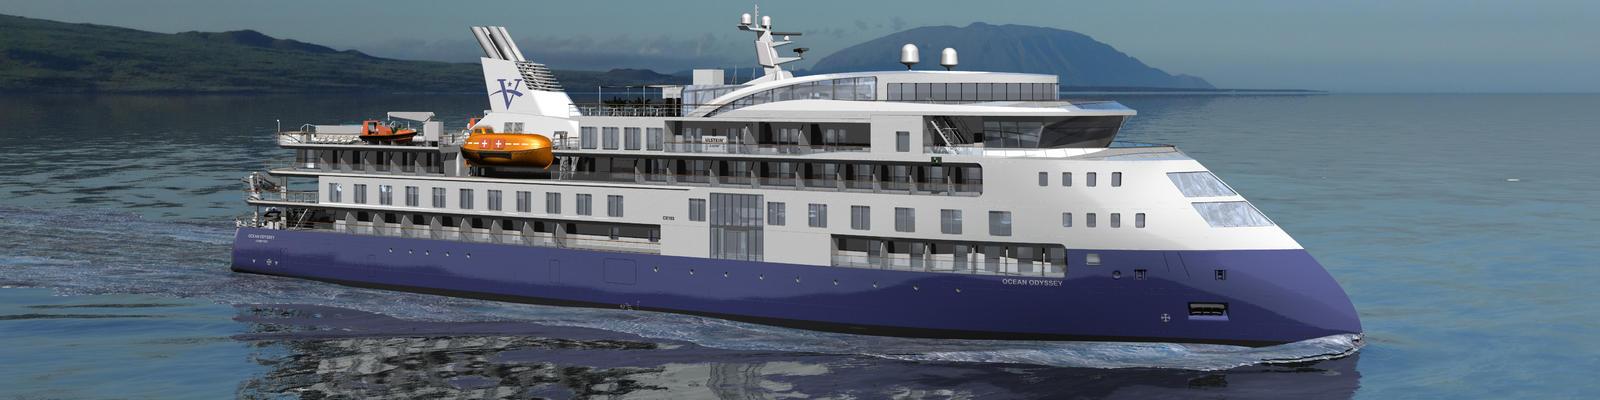 Ocean Odyssey (Image: Vantage Deluxe World Travel)